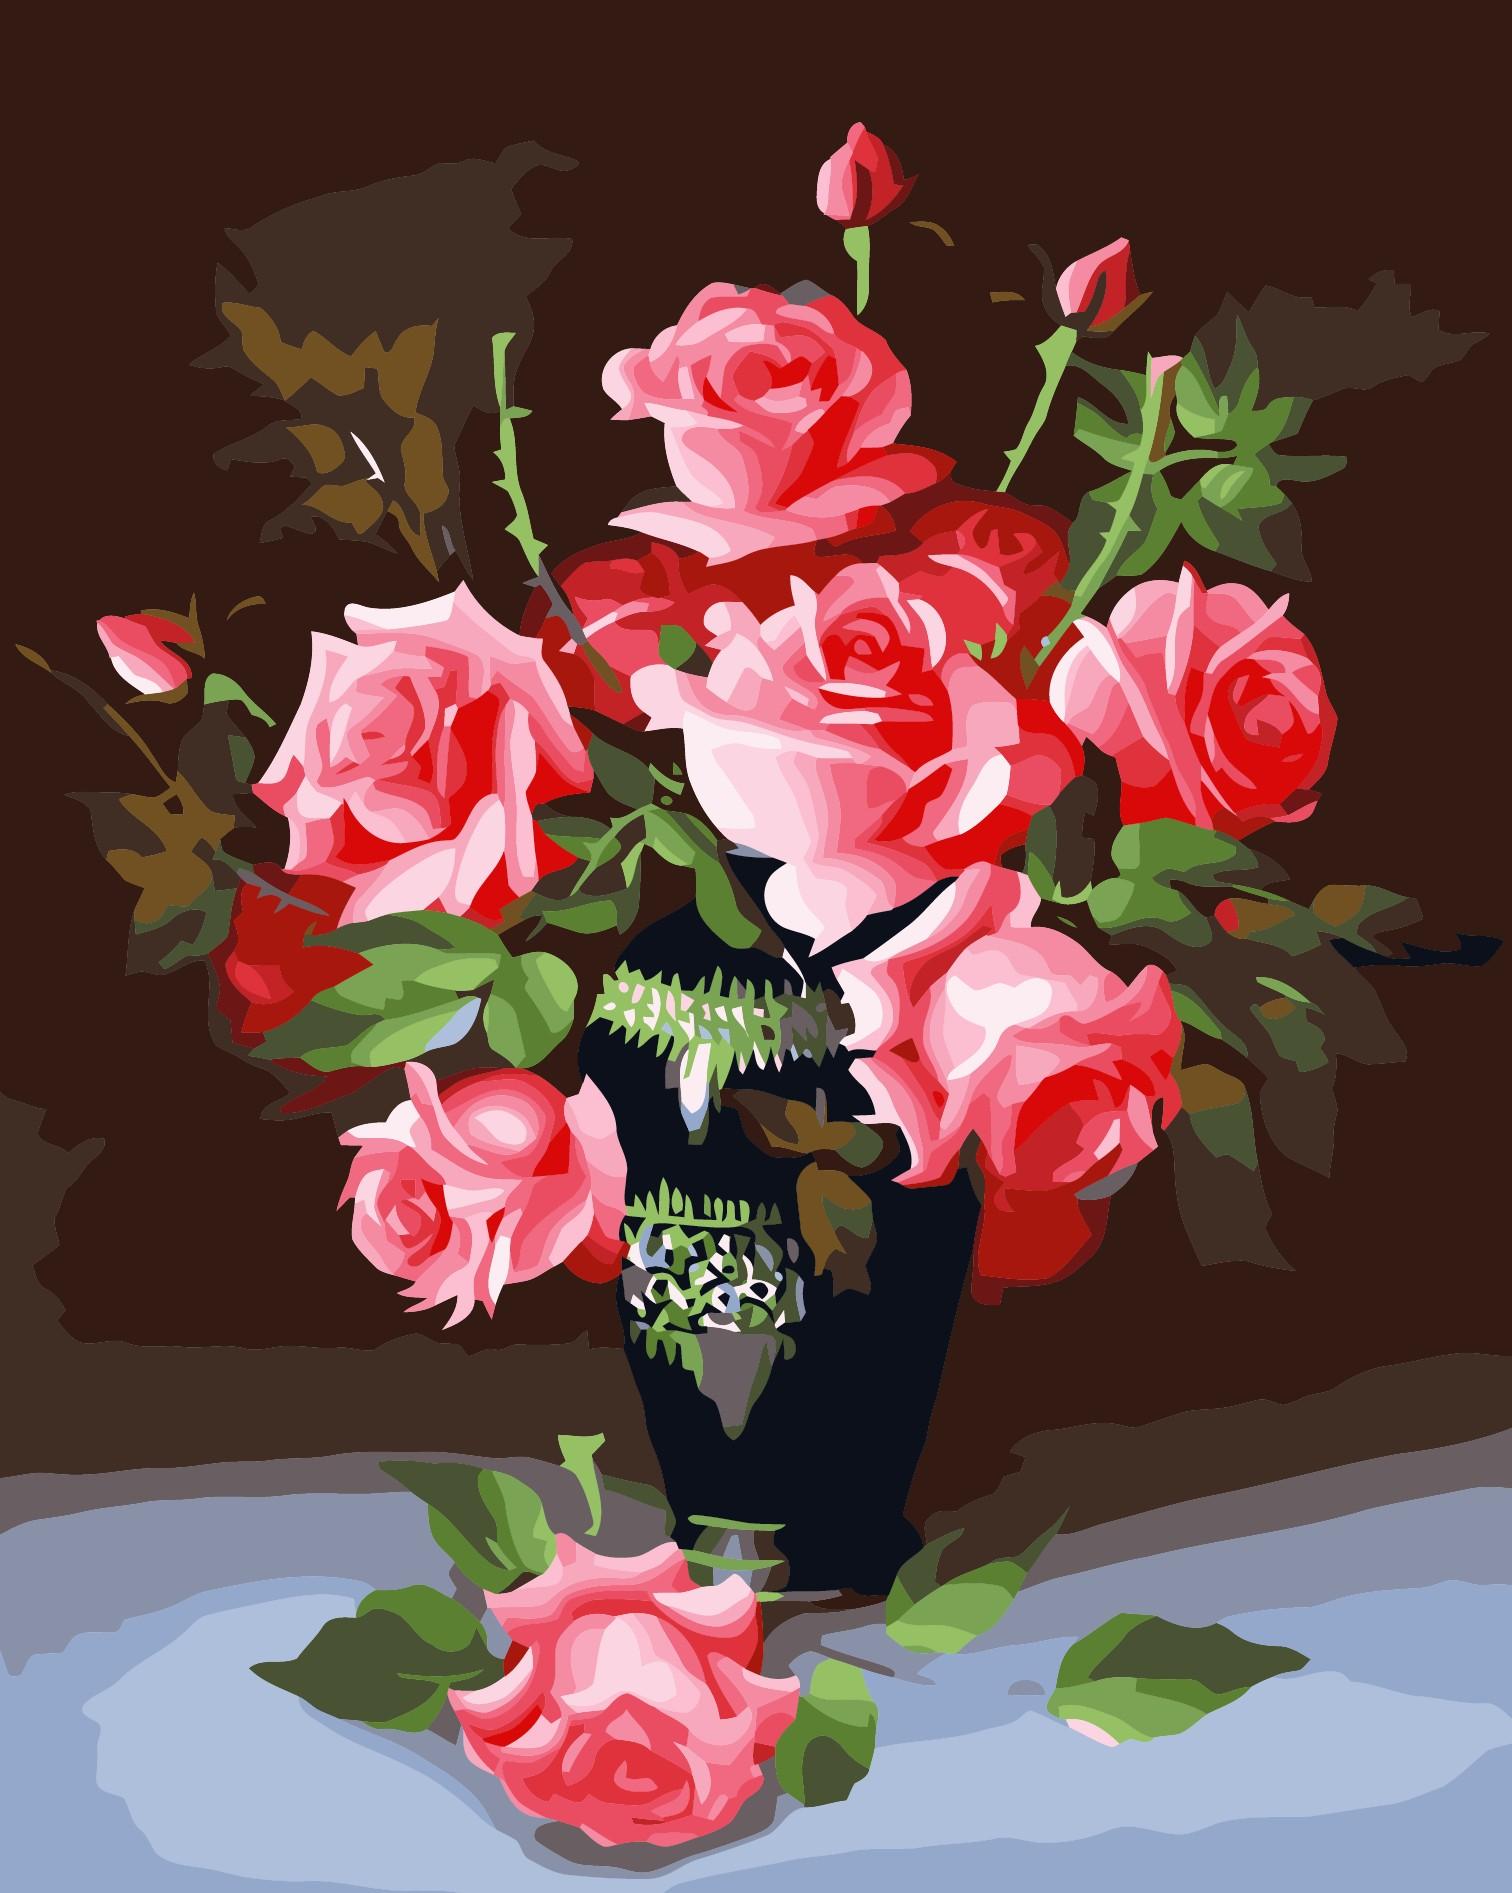 Drawn vase red rose Alibaba Acrylic Canvas Decoration Oil